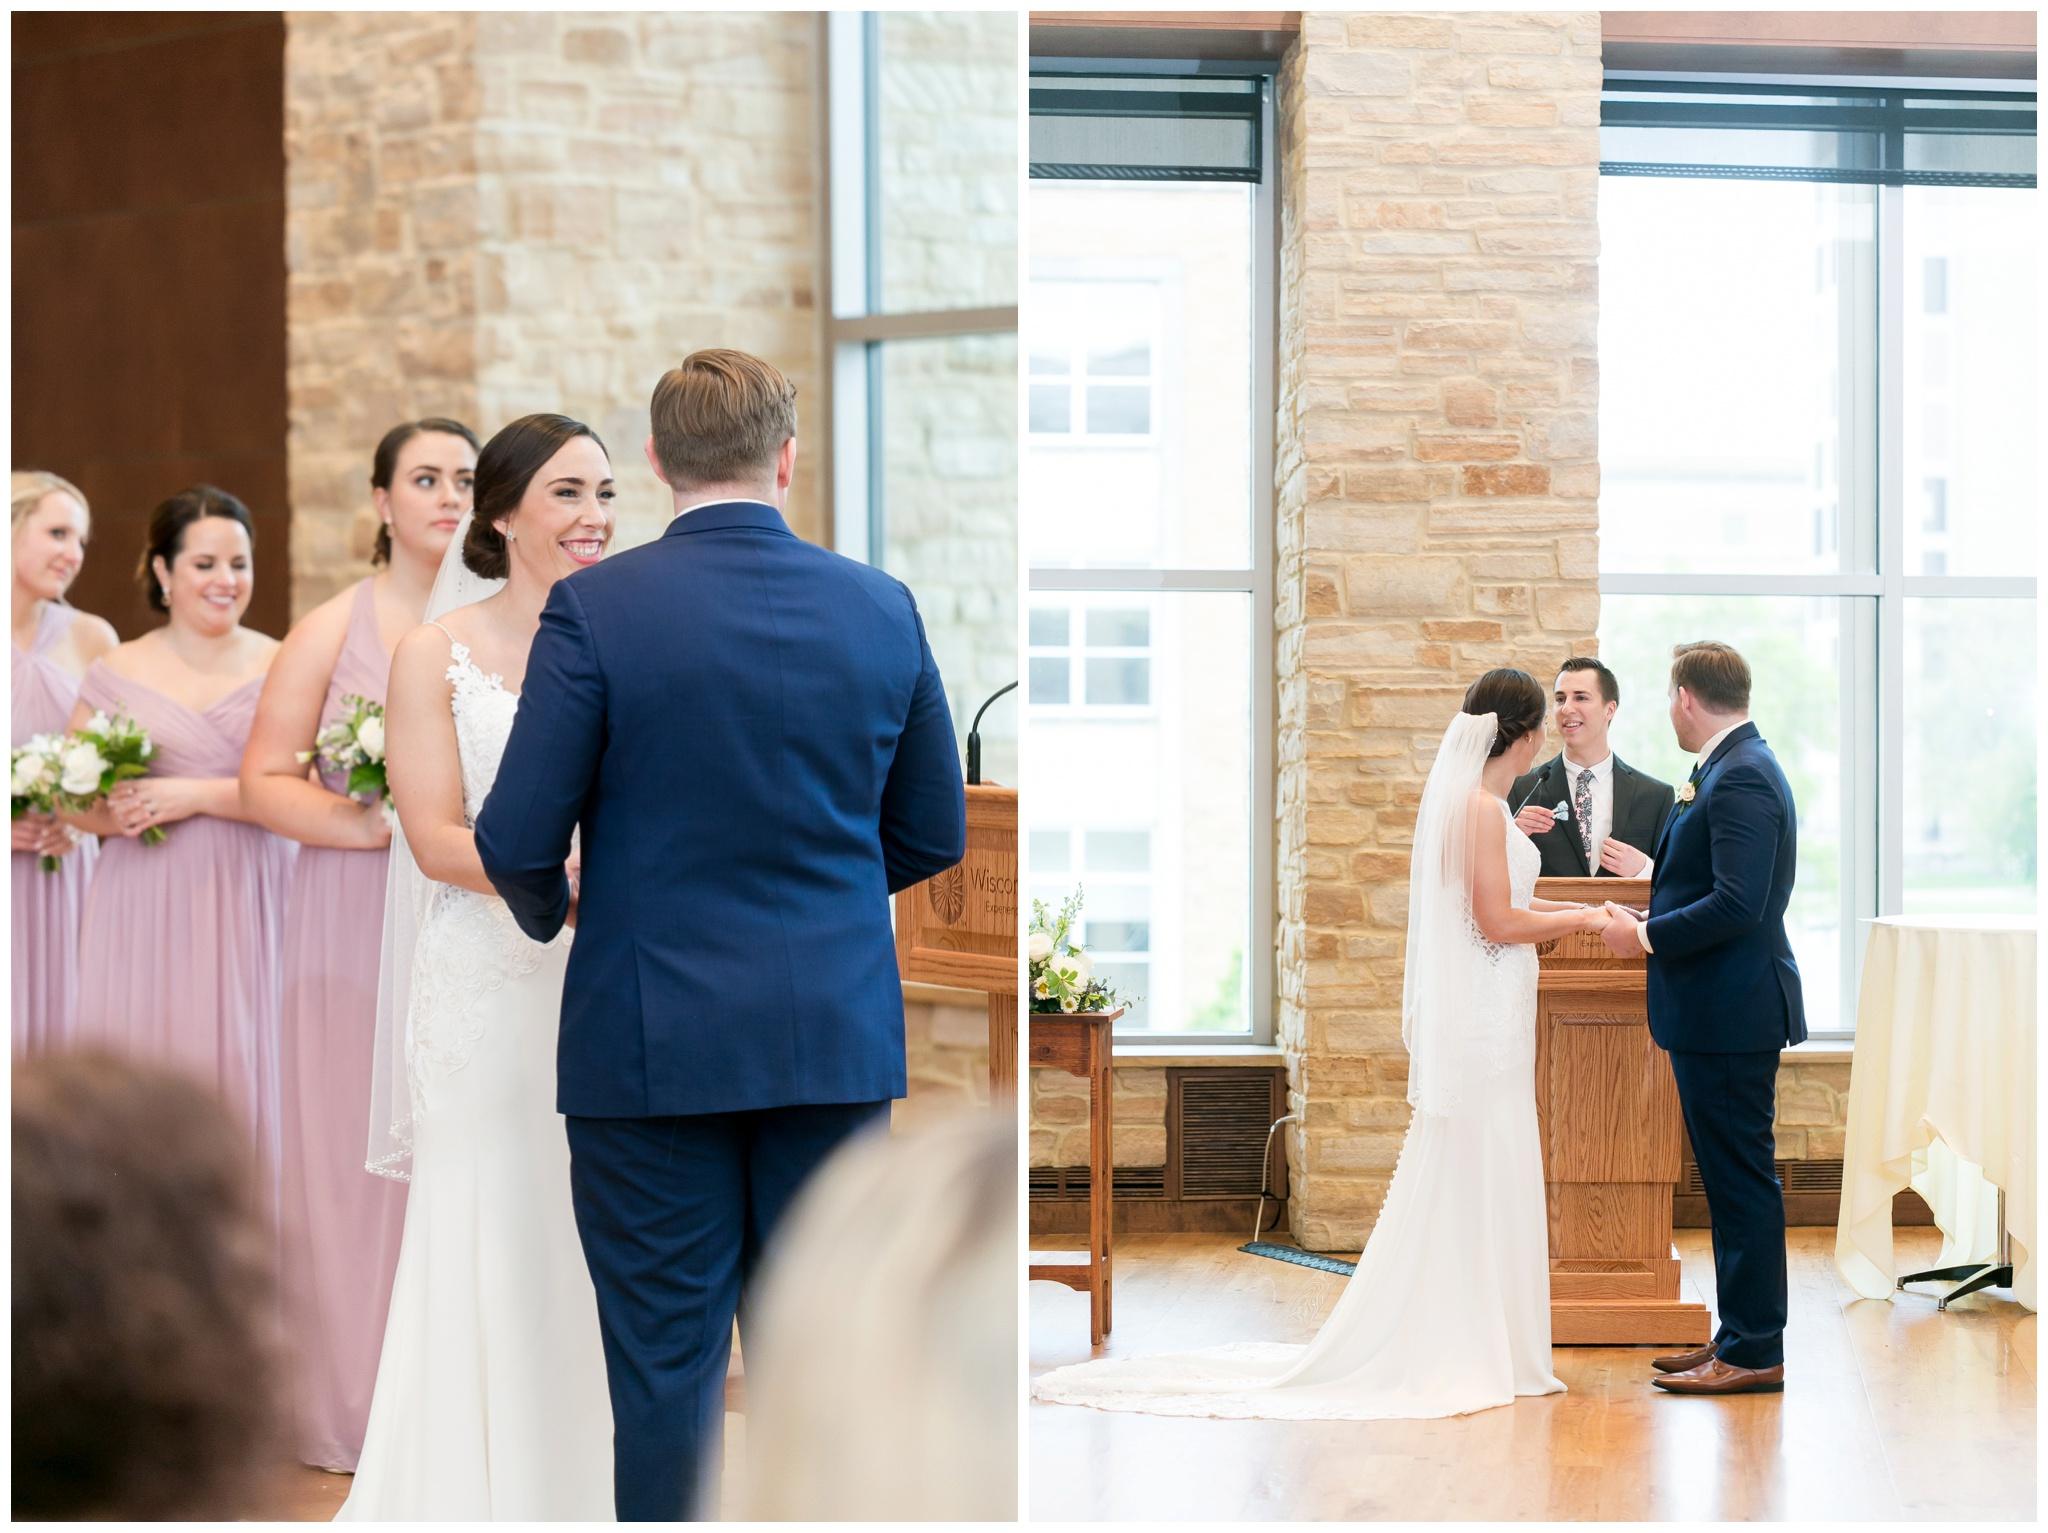 Union_south_Wedding_Madison_Wisconsin_Caynay_Photo_3674.jpg